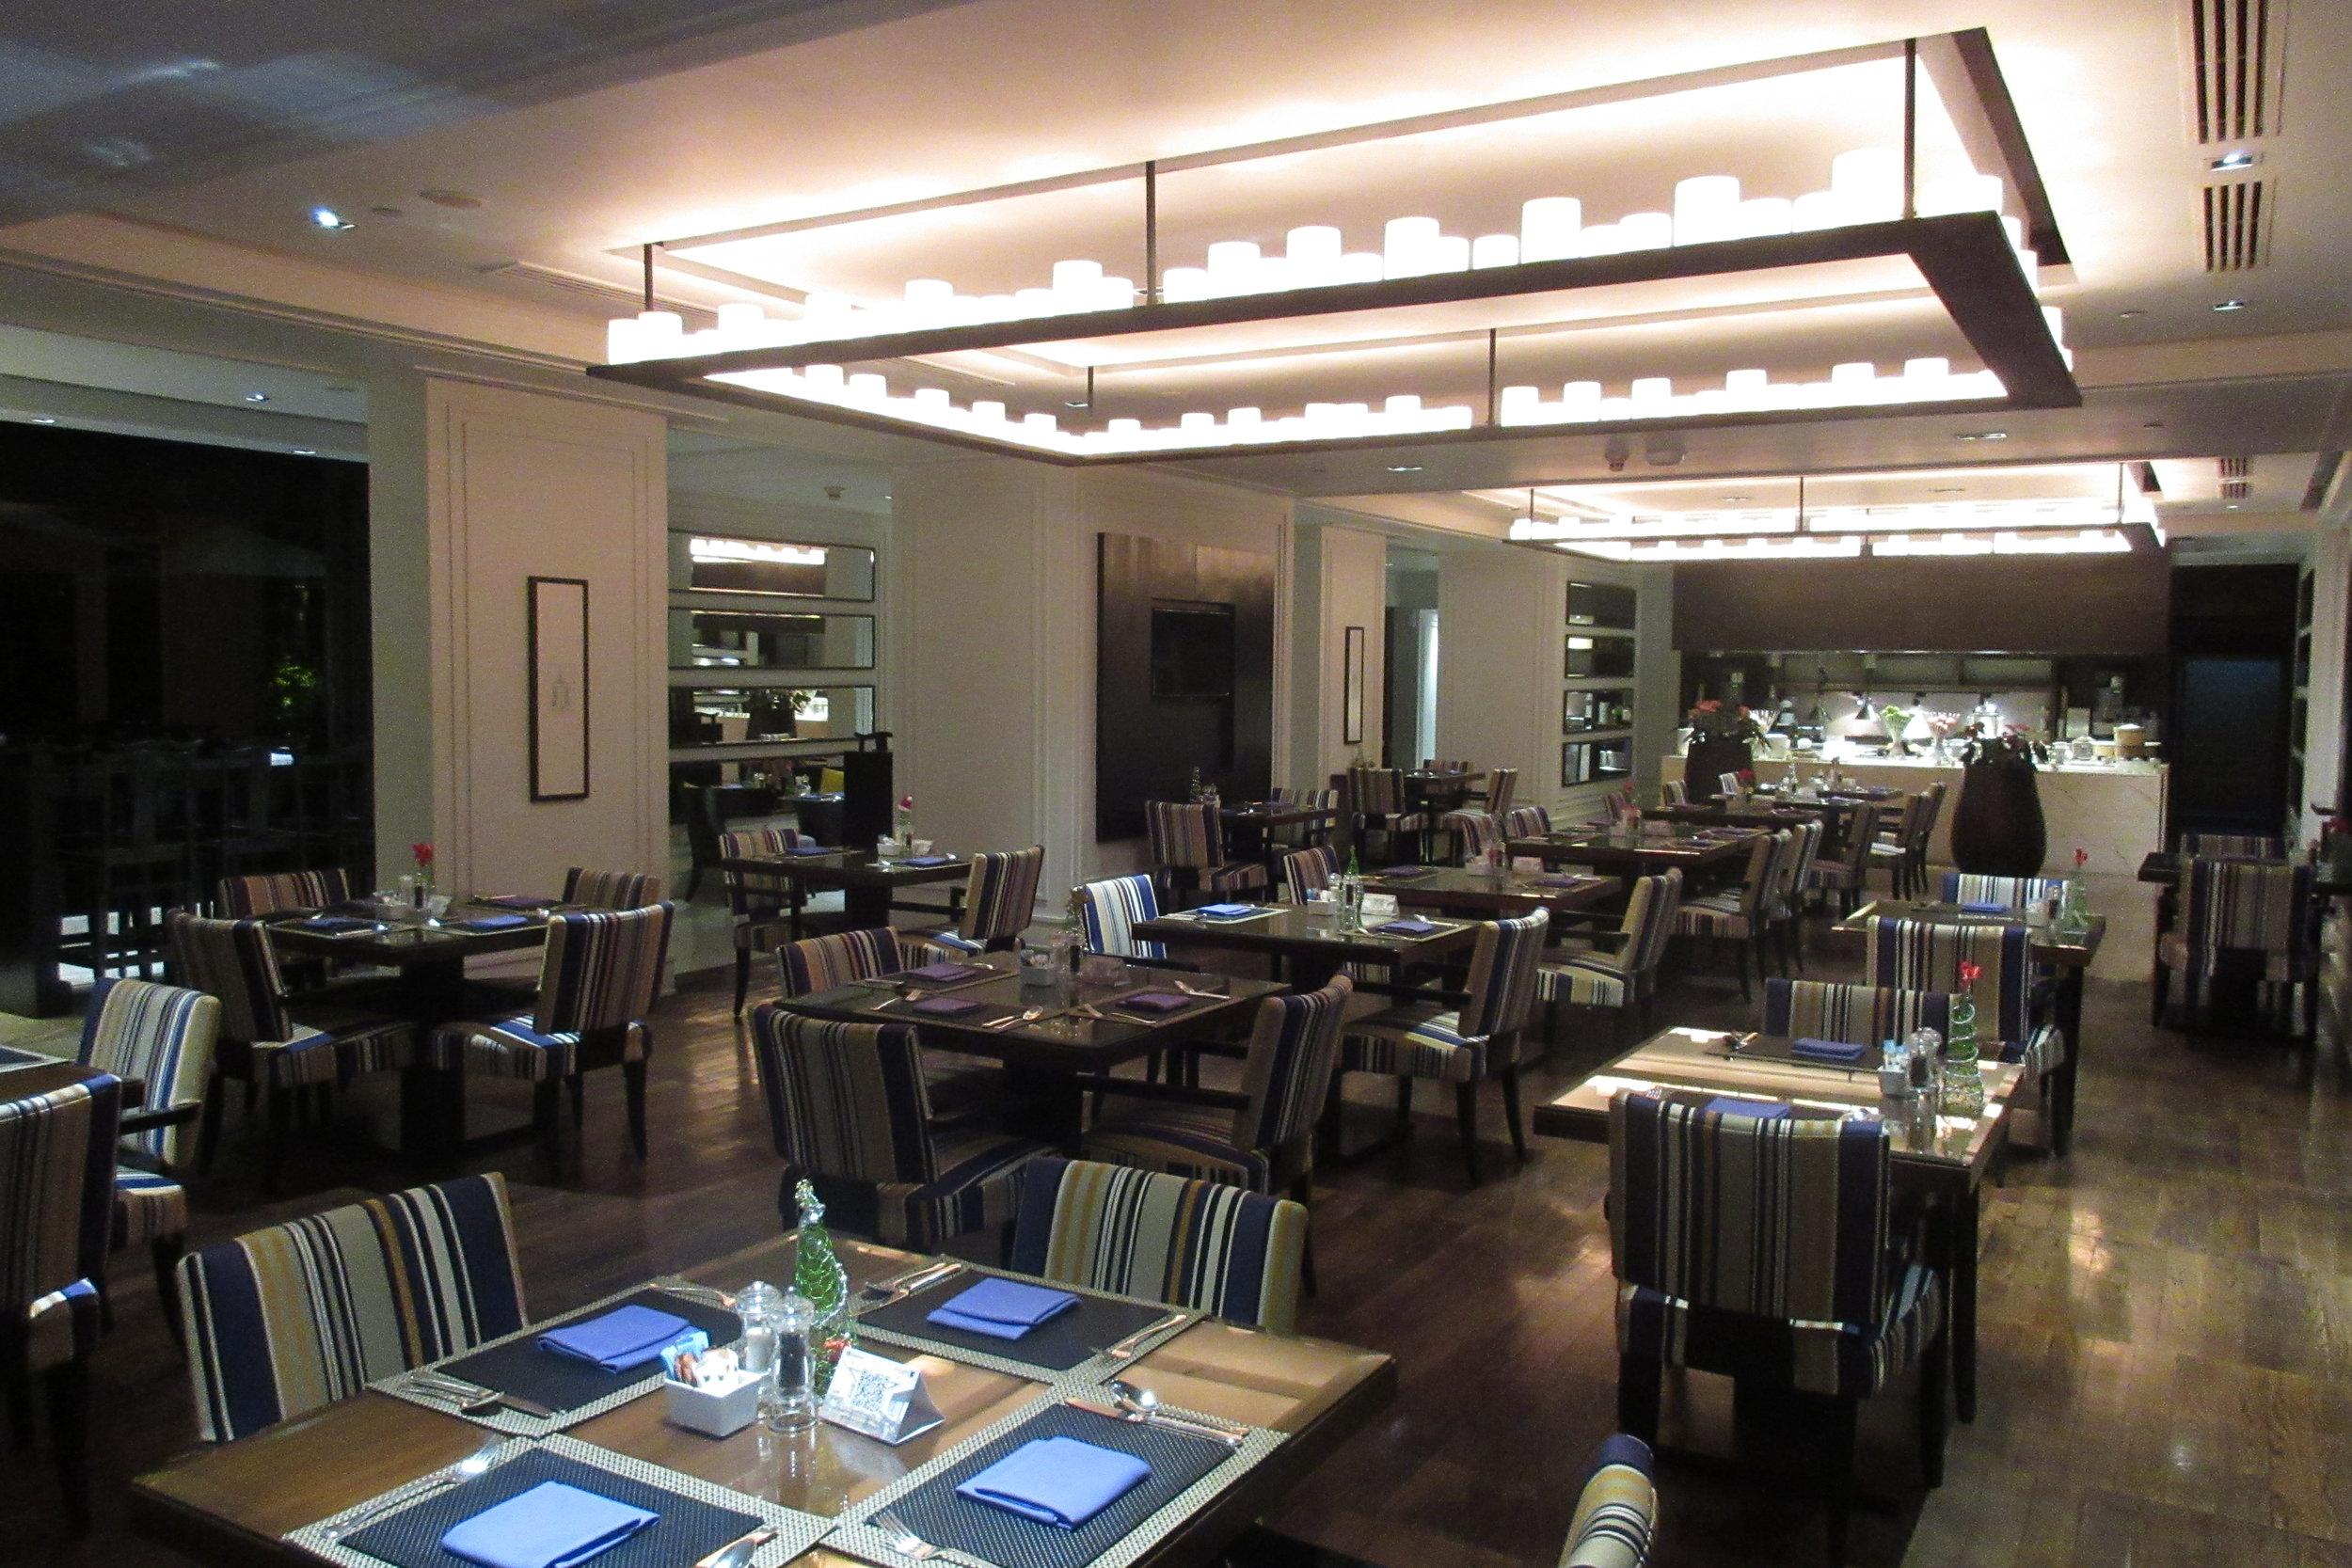 JW Marriott Bangkok – Club Lounge seating area